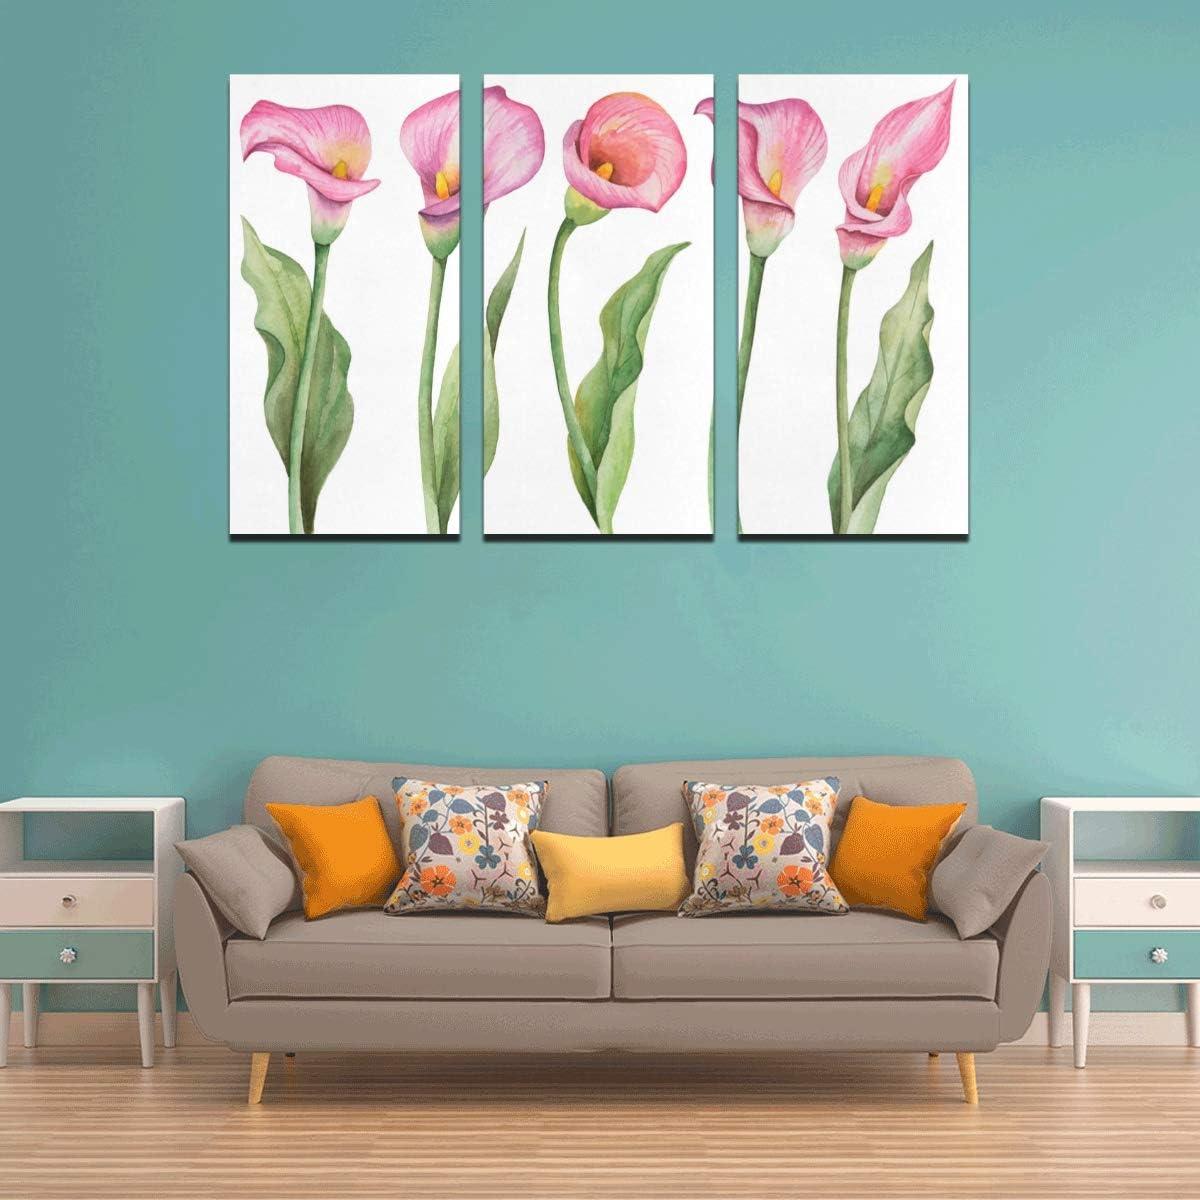 LIANPEN 3 Panel Beautiful Wall Art Elegant Fashionable Calla Lily Art Mirror Wall Decor Printing On Canvas Decorative Kitchen Wall Art for Home Living Room Bedroom Bathroom Wall Decor Posters